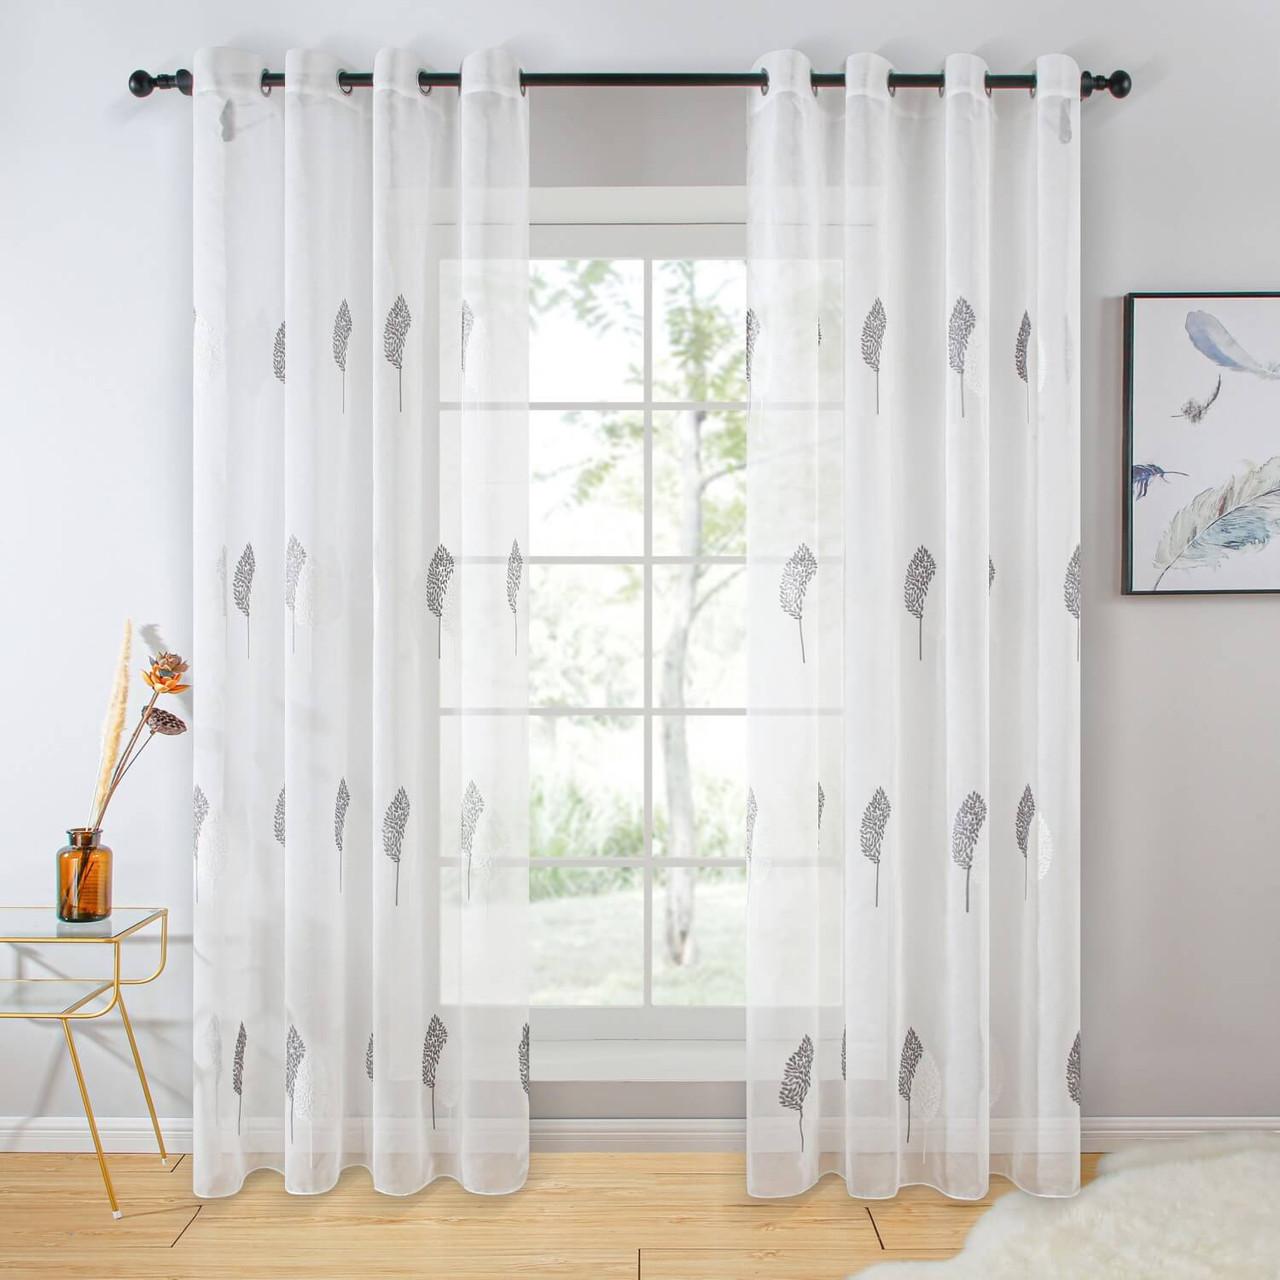 Sheer Curtain Panel Grommet-Top Window Treatments DMC724 Dolce Mela 8171460151600